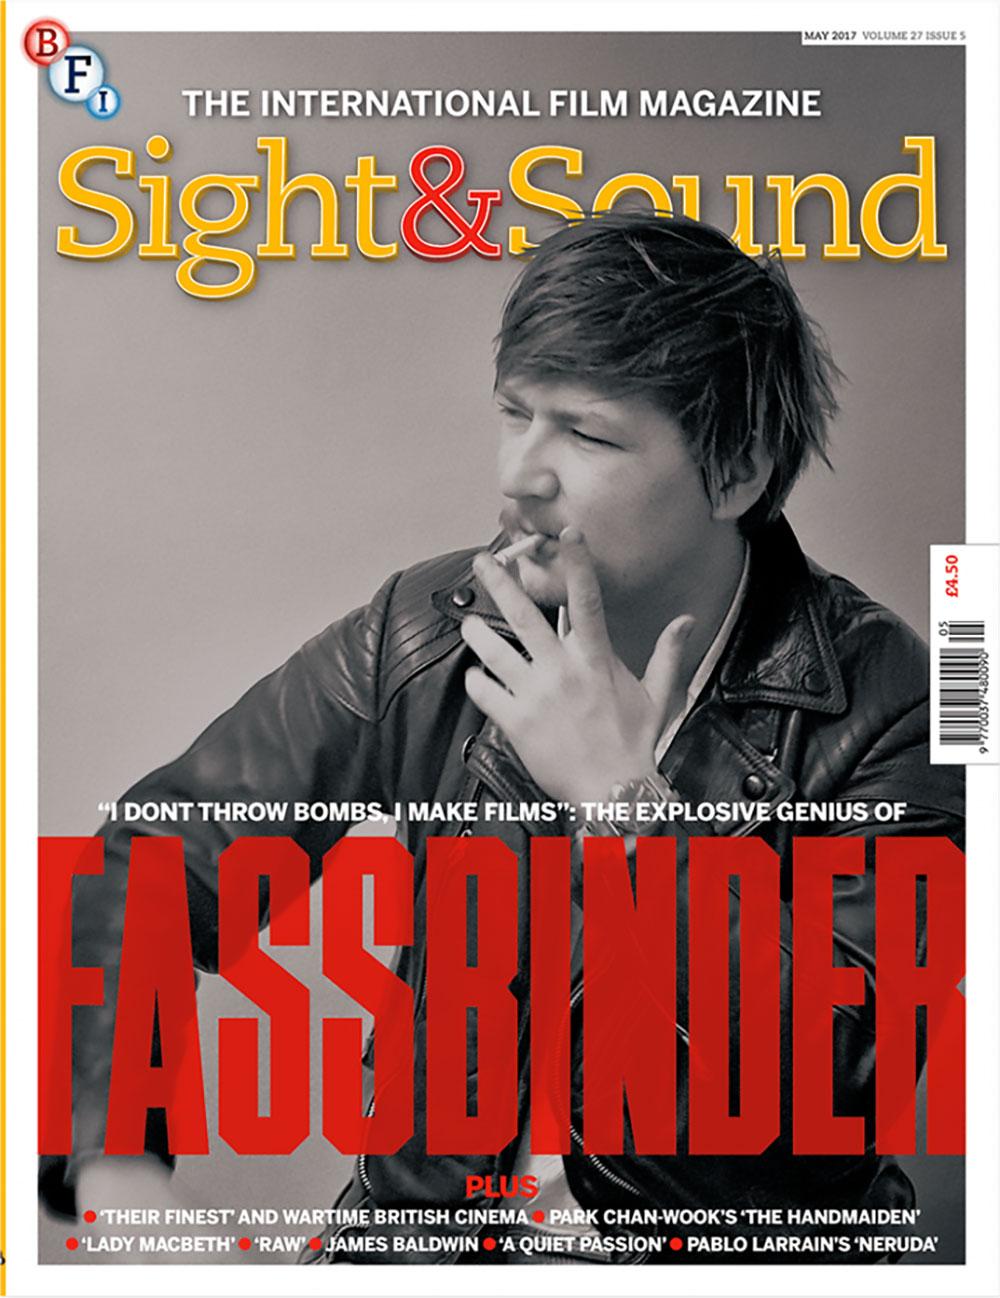 Buy May 2017 Sight & Sound